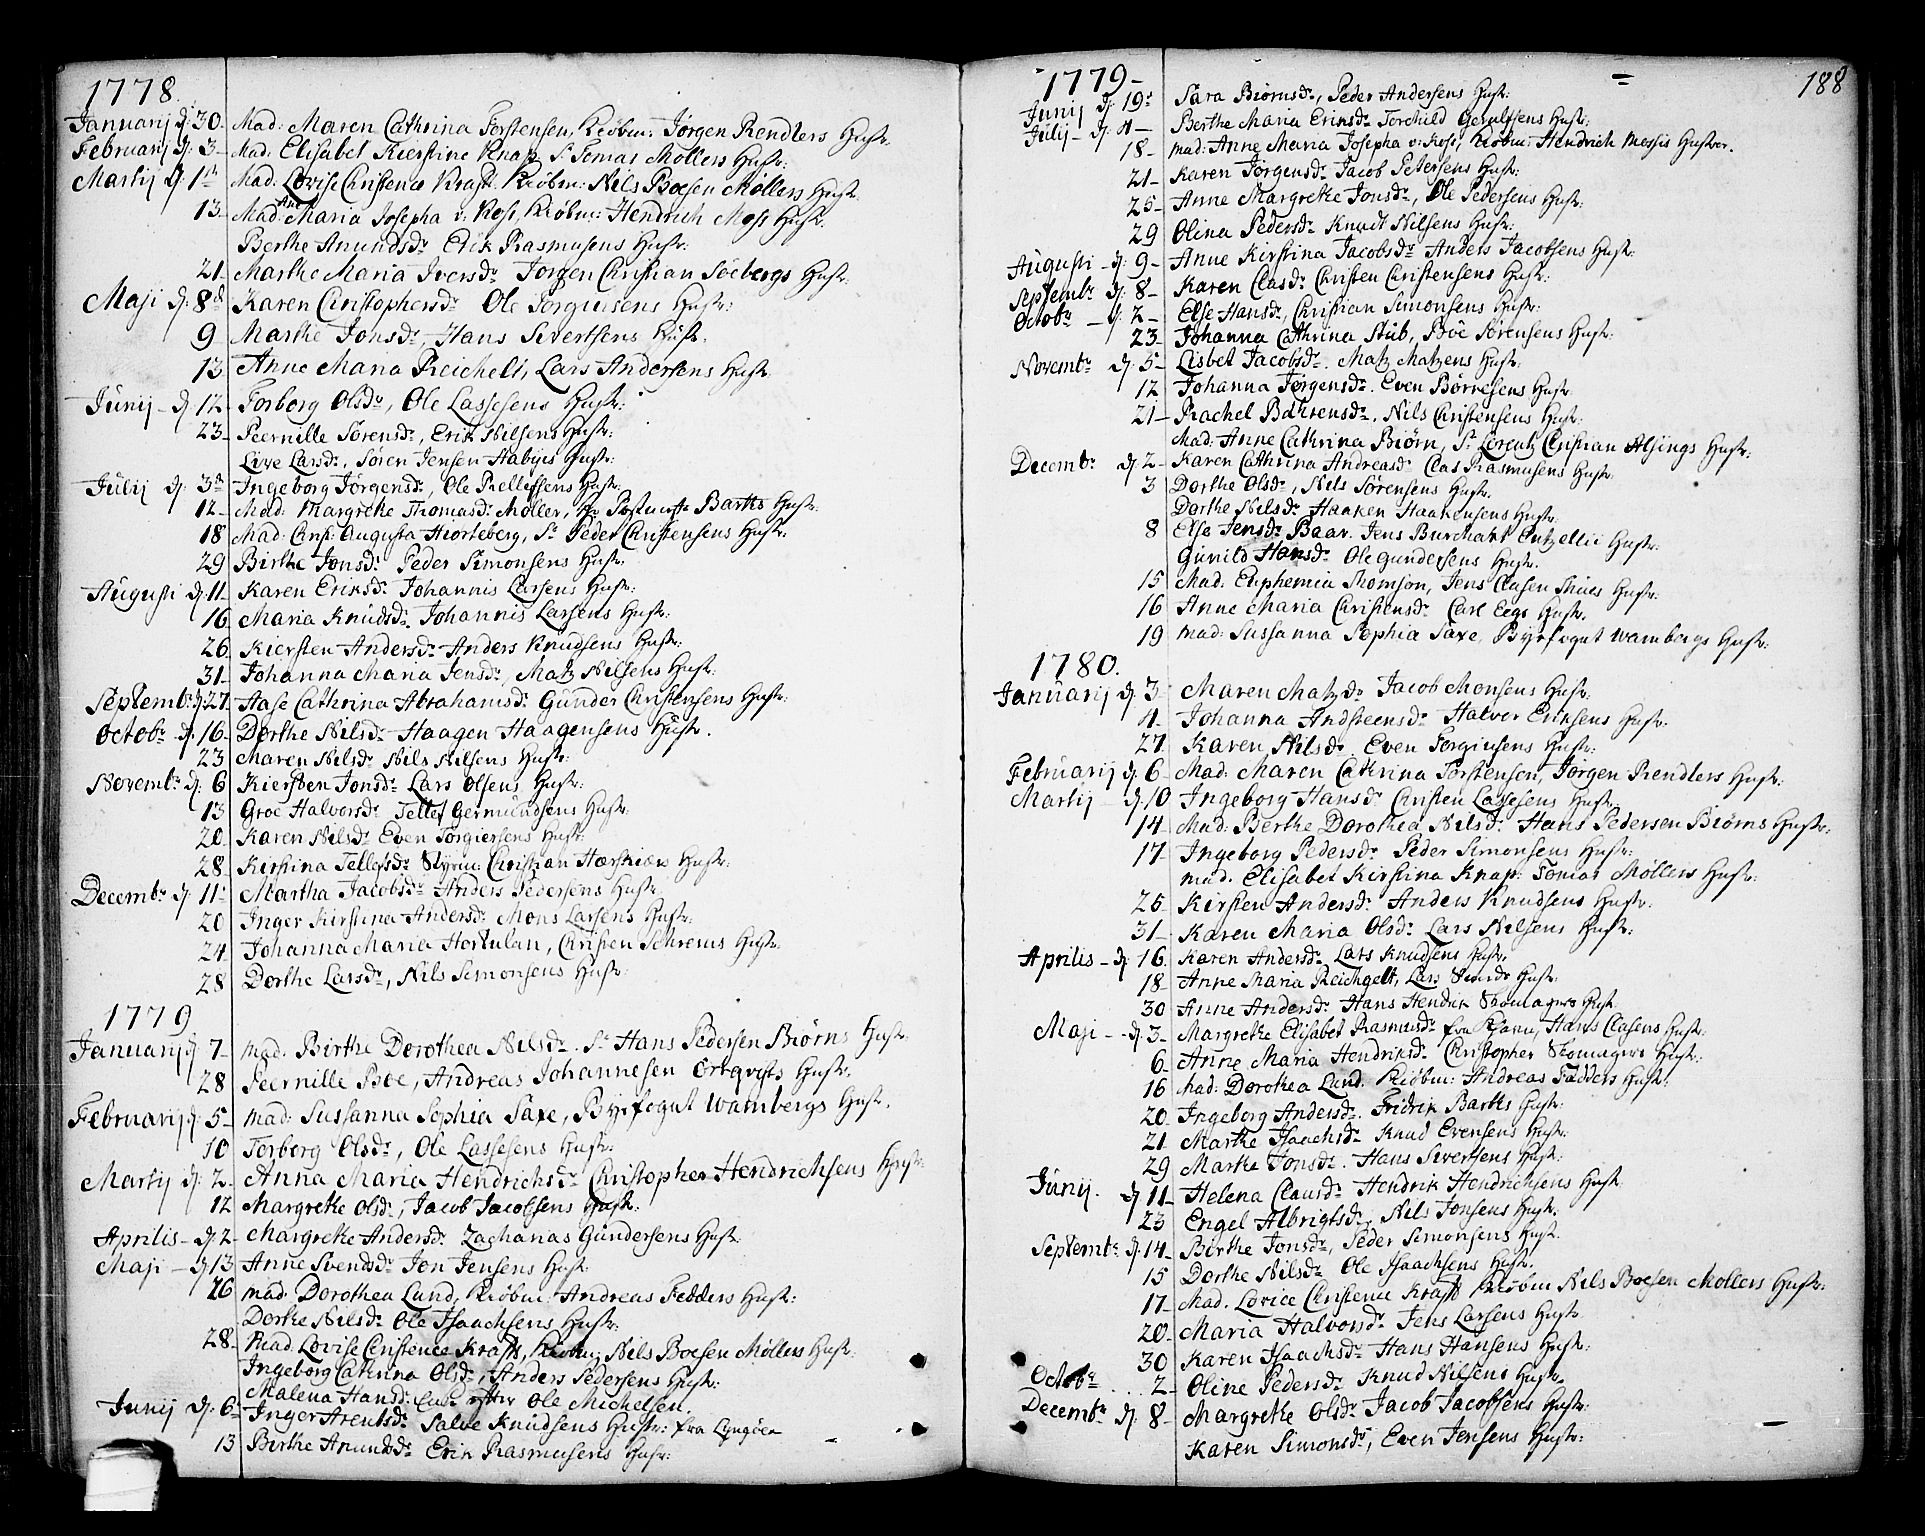 SAKO, Kragerø kirkebøker, F/Fa/L0002: Ministerialbok nr. 2, 1767-1802, s. 188